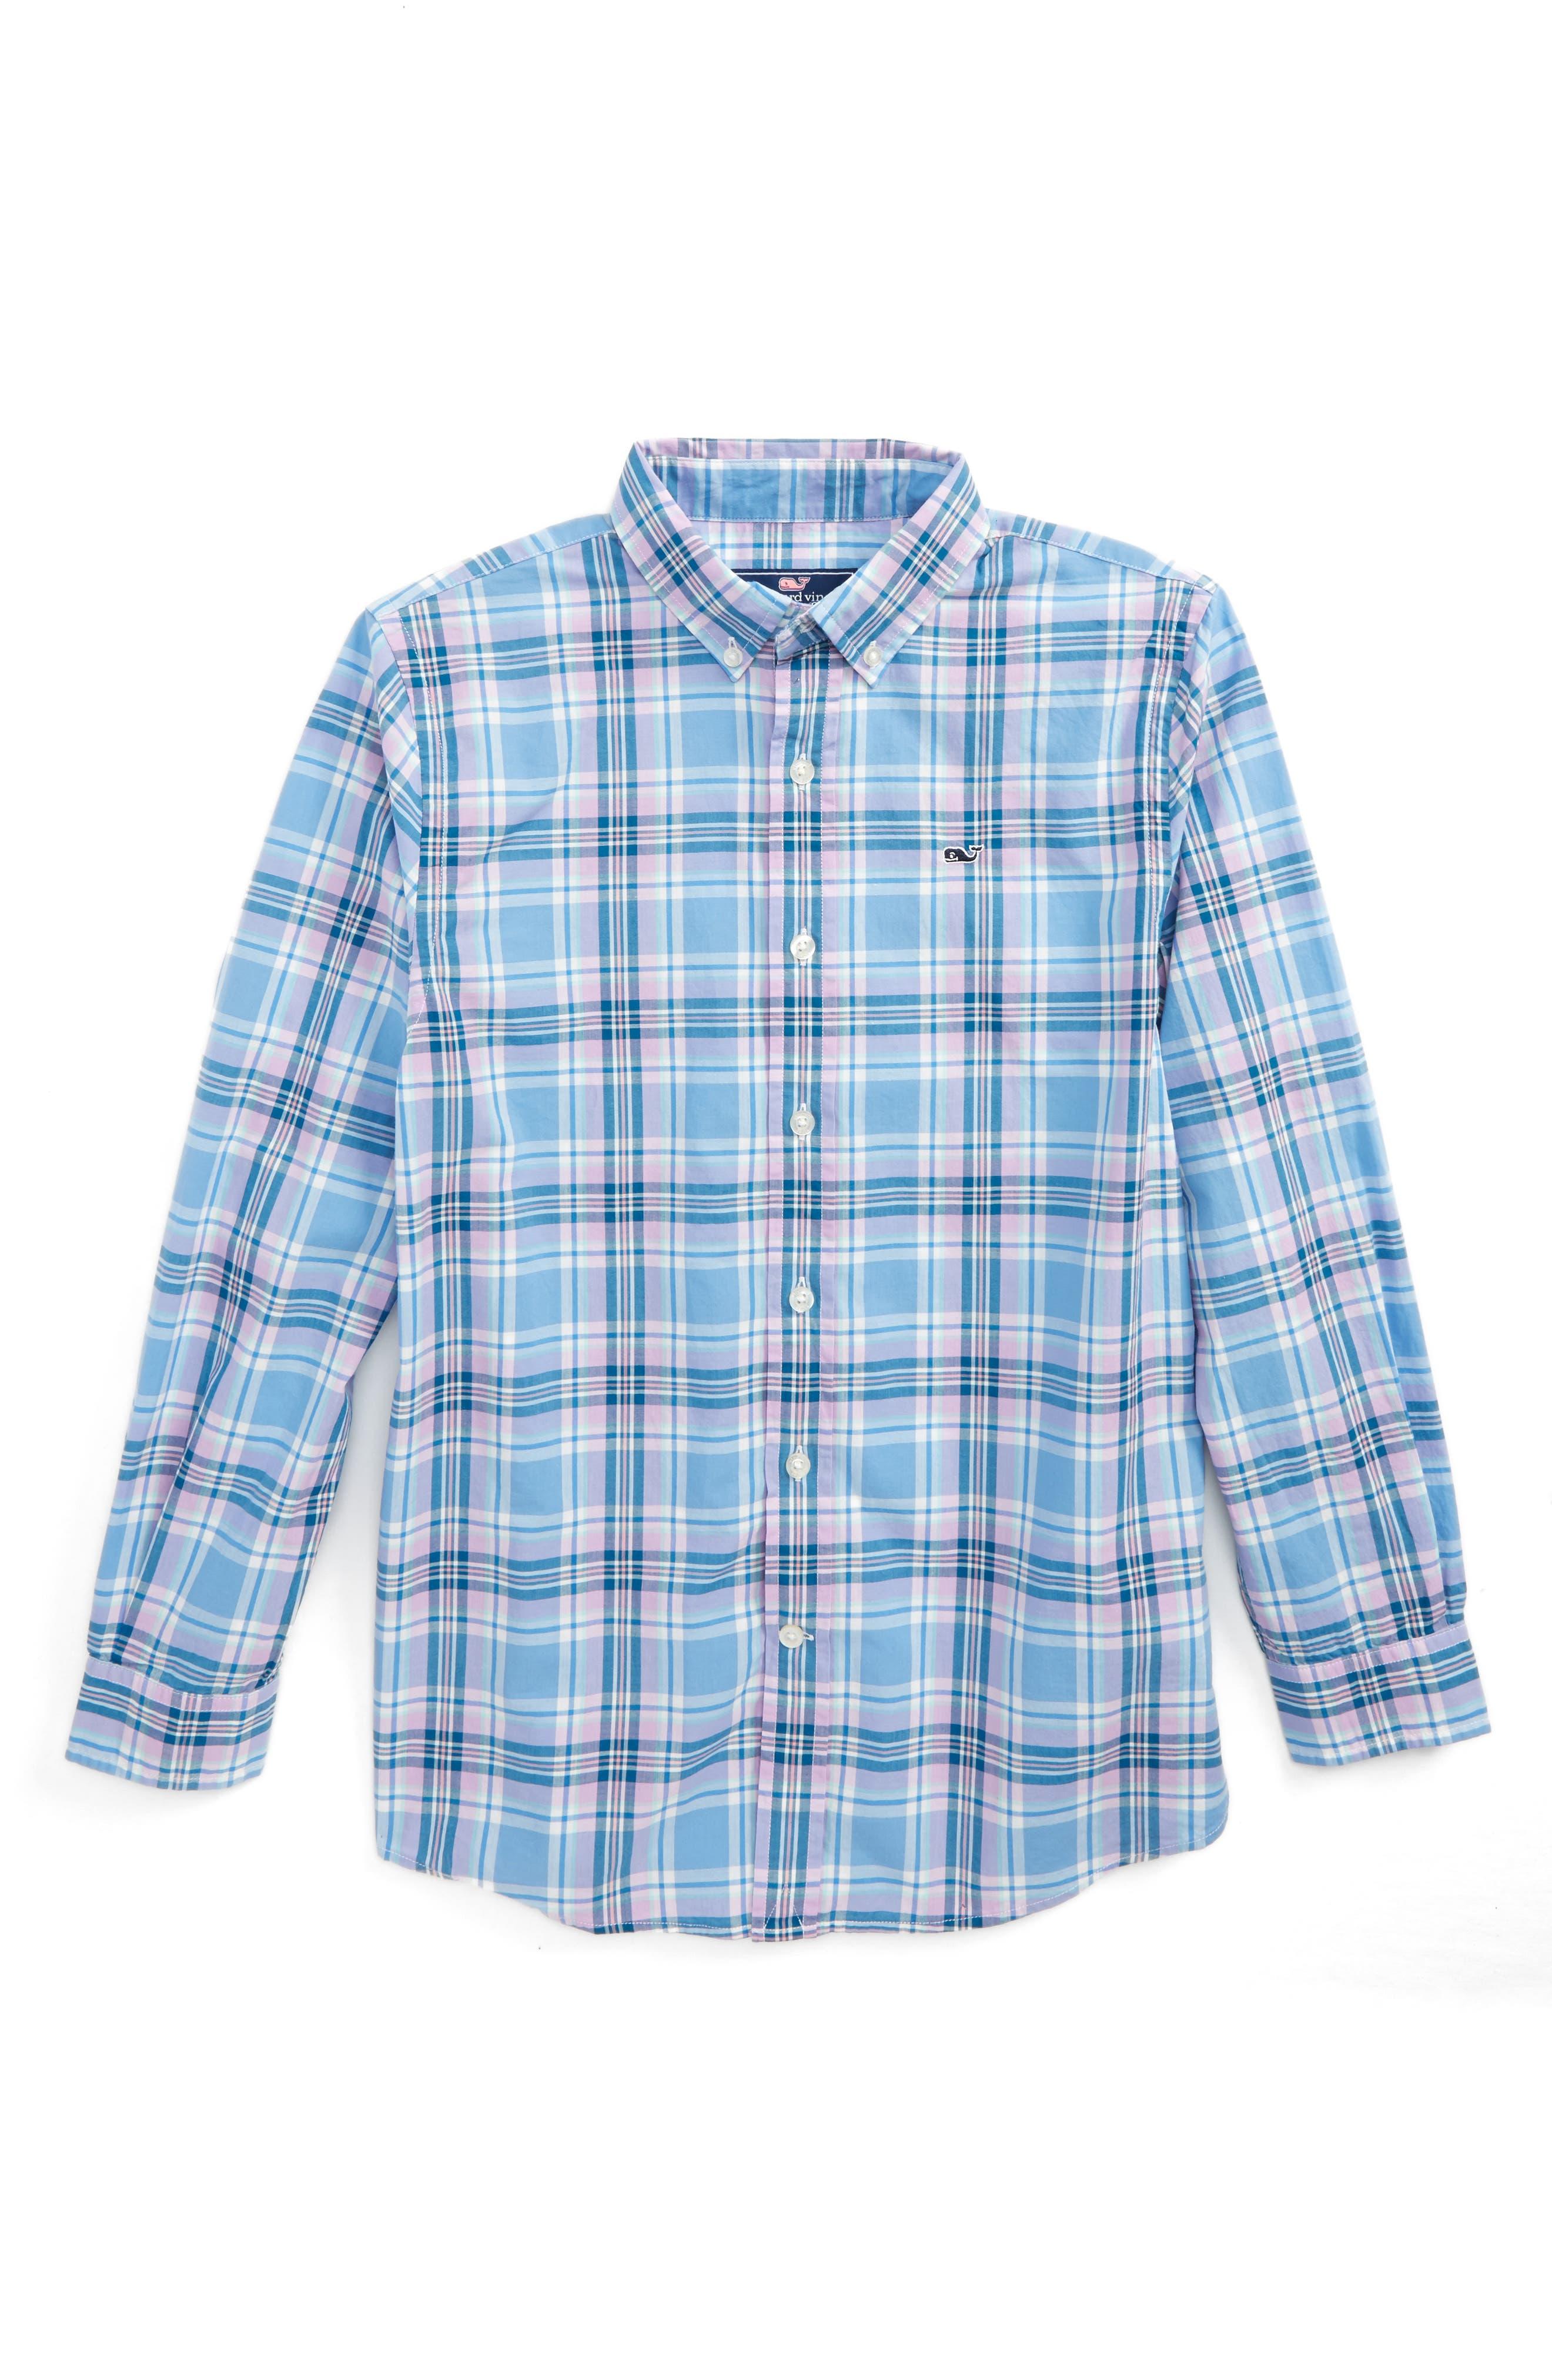 Ocean Walk Plaid Shirt,                         Main,                         color, Crocus